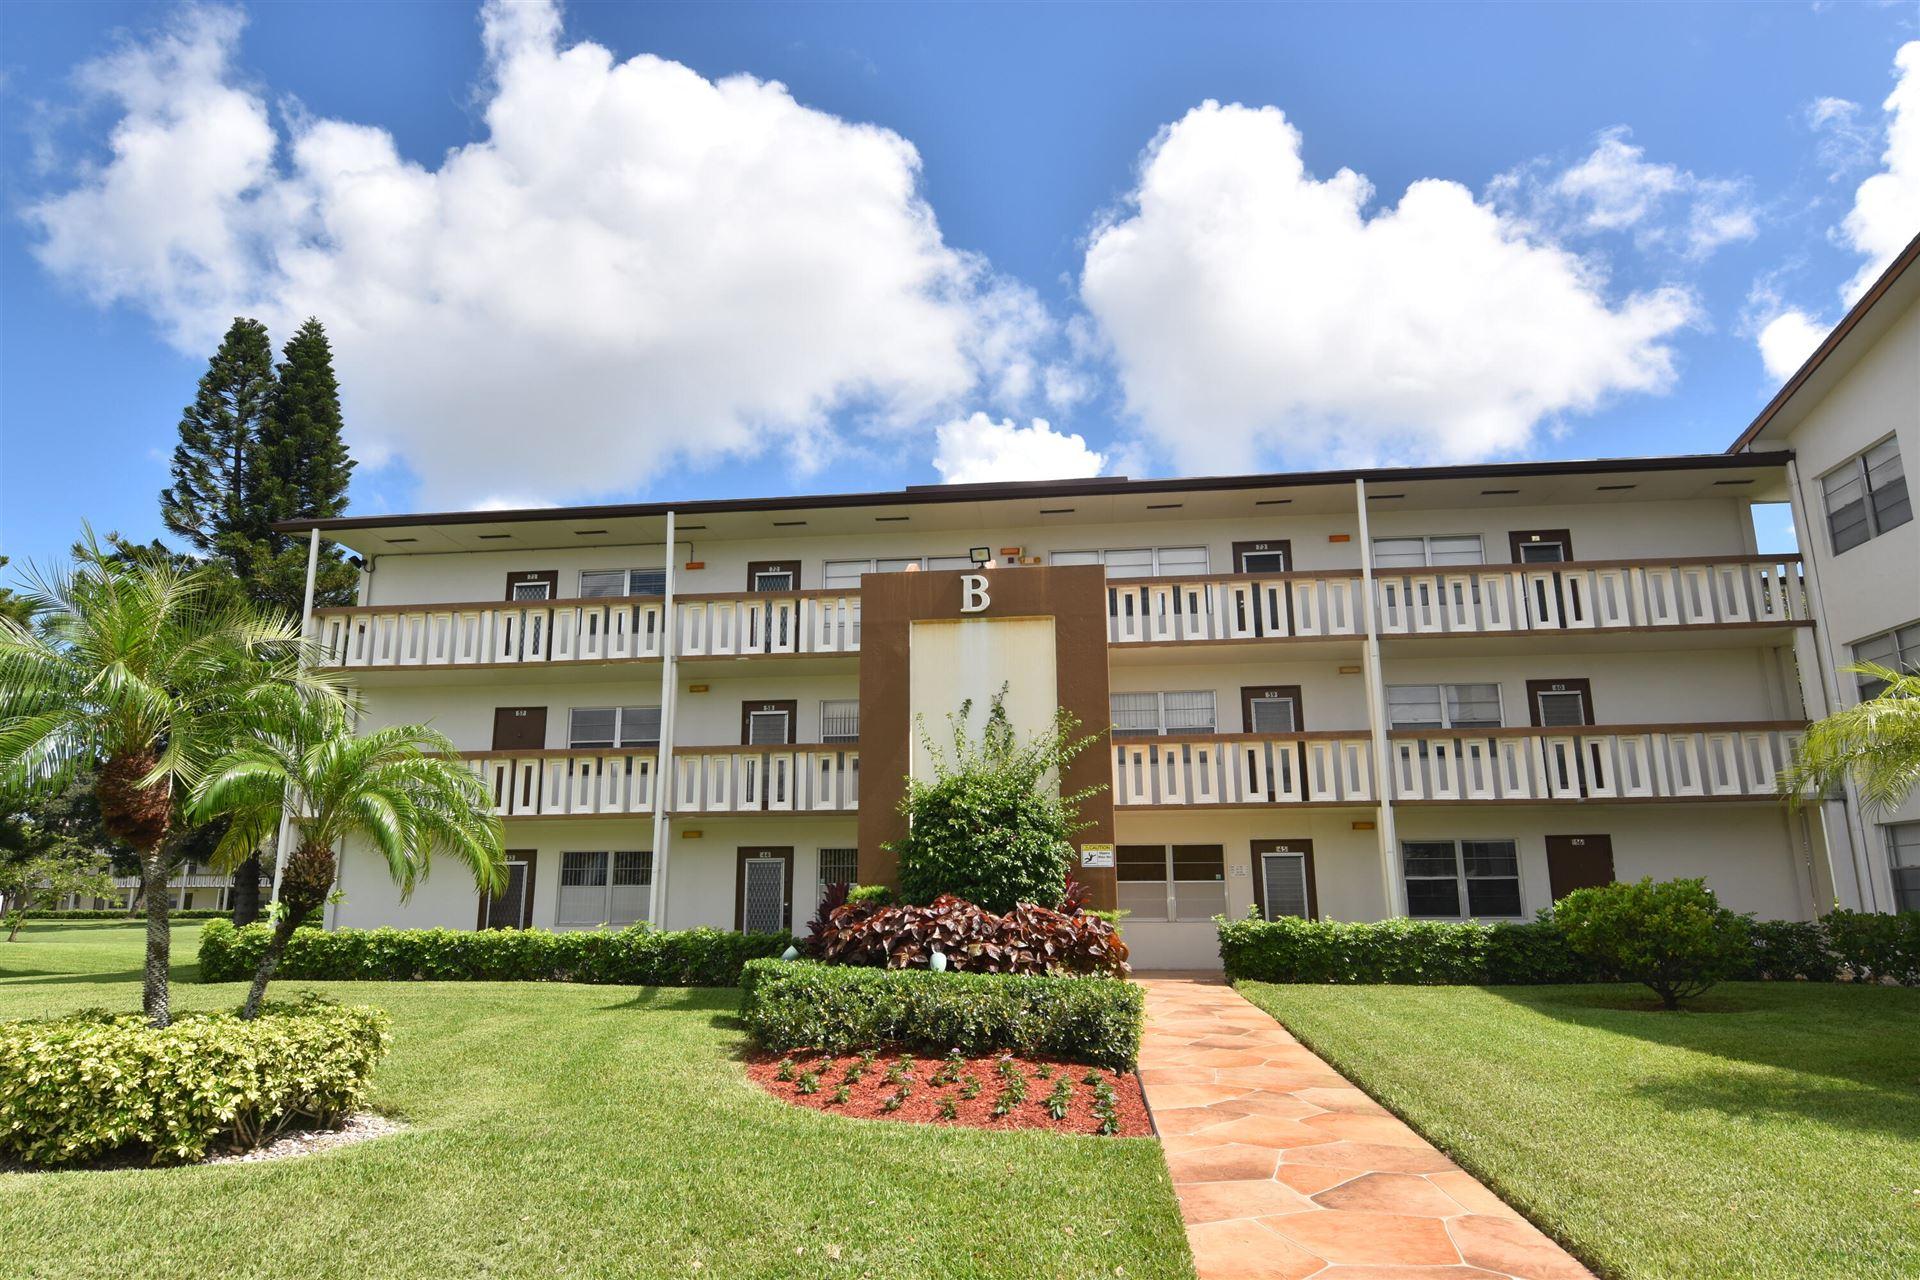 63 Mansfield B #B, Boca Raton, FL 33434 - #: RX-10731269